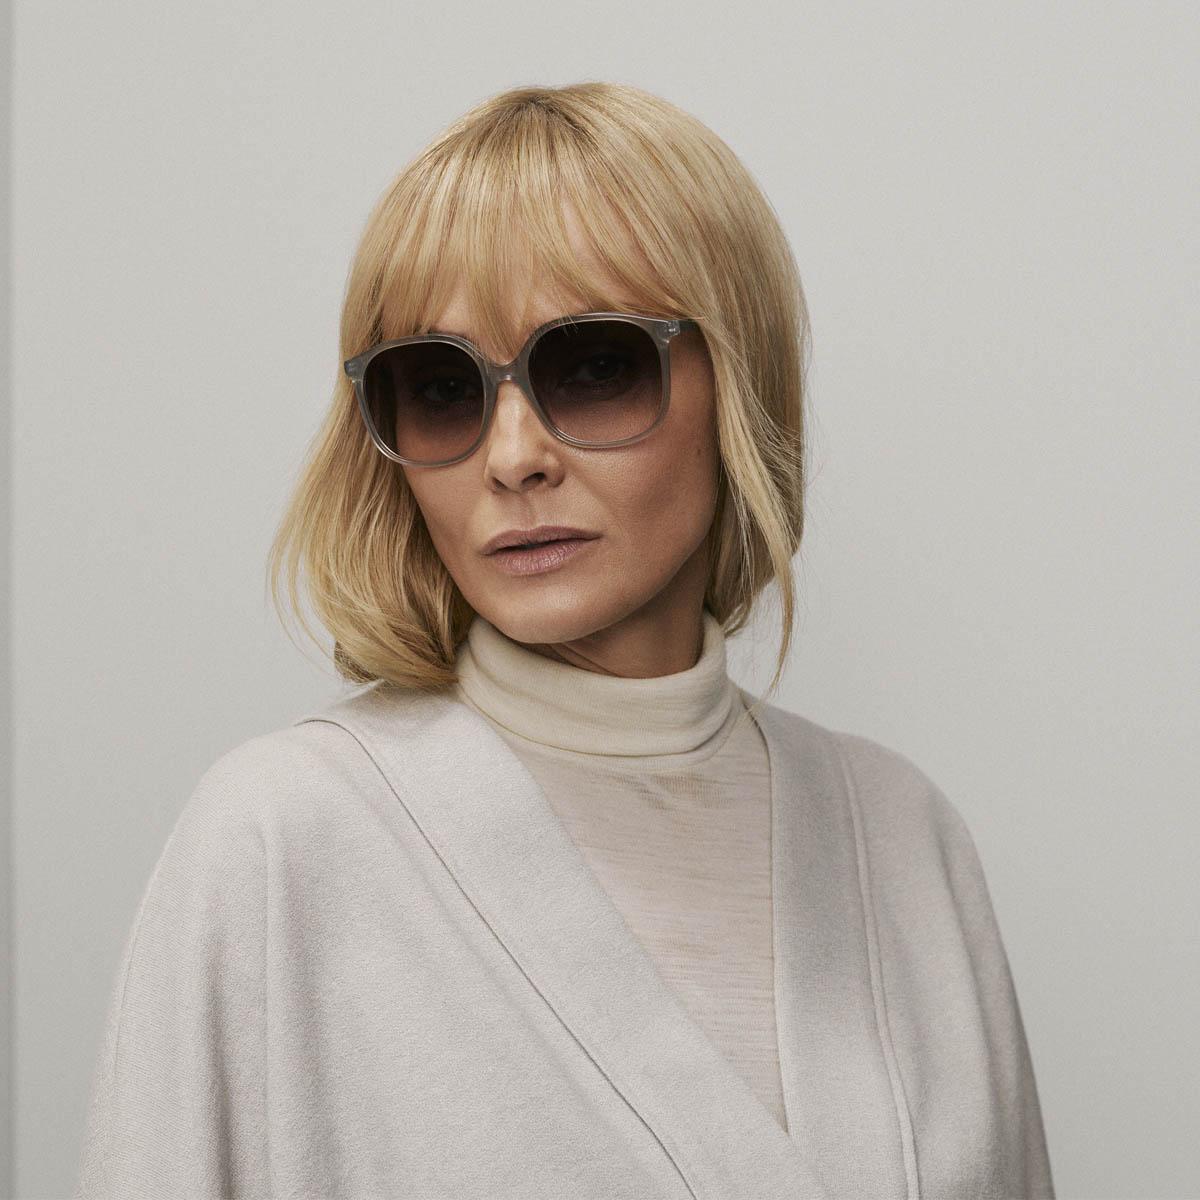 Sunglasses trend 2020 70s